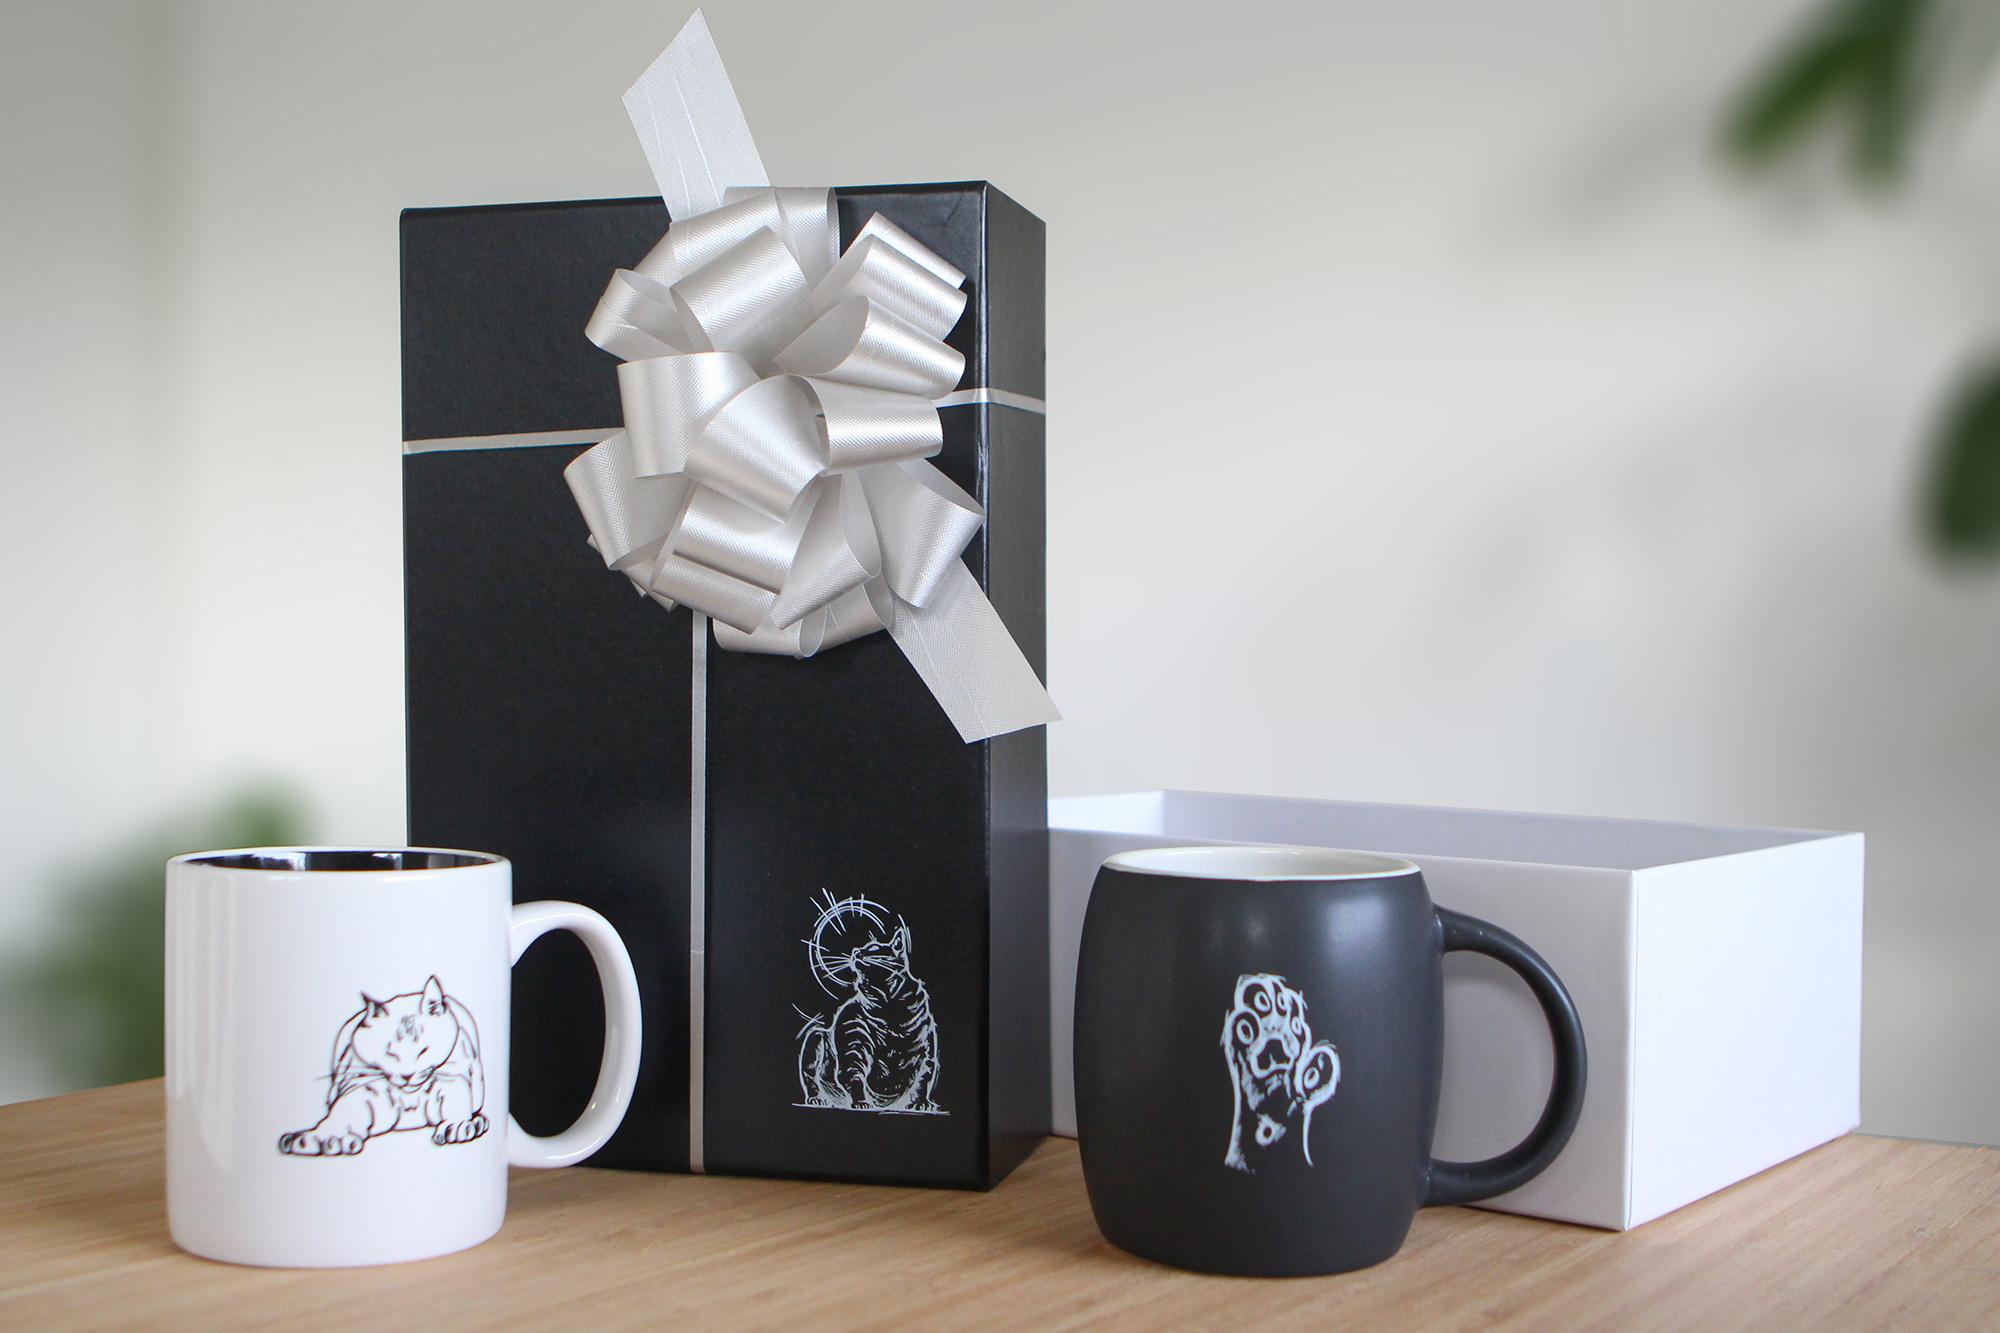 Bronson mug set